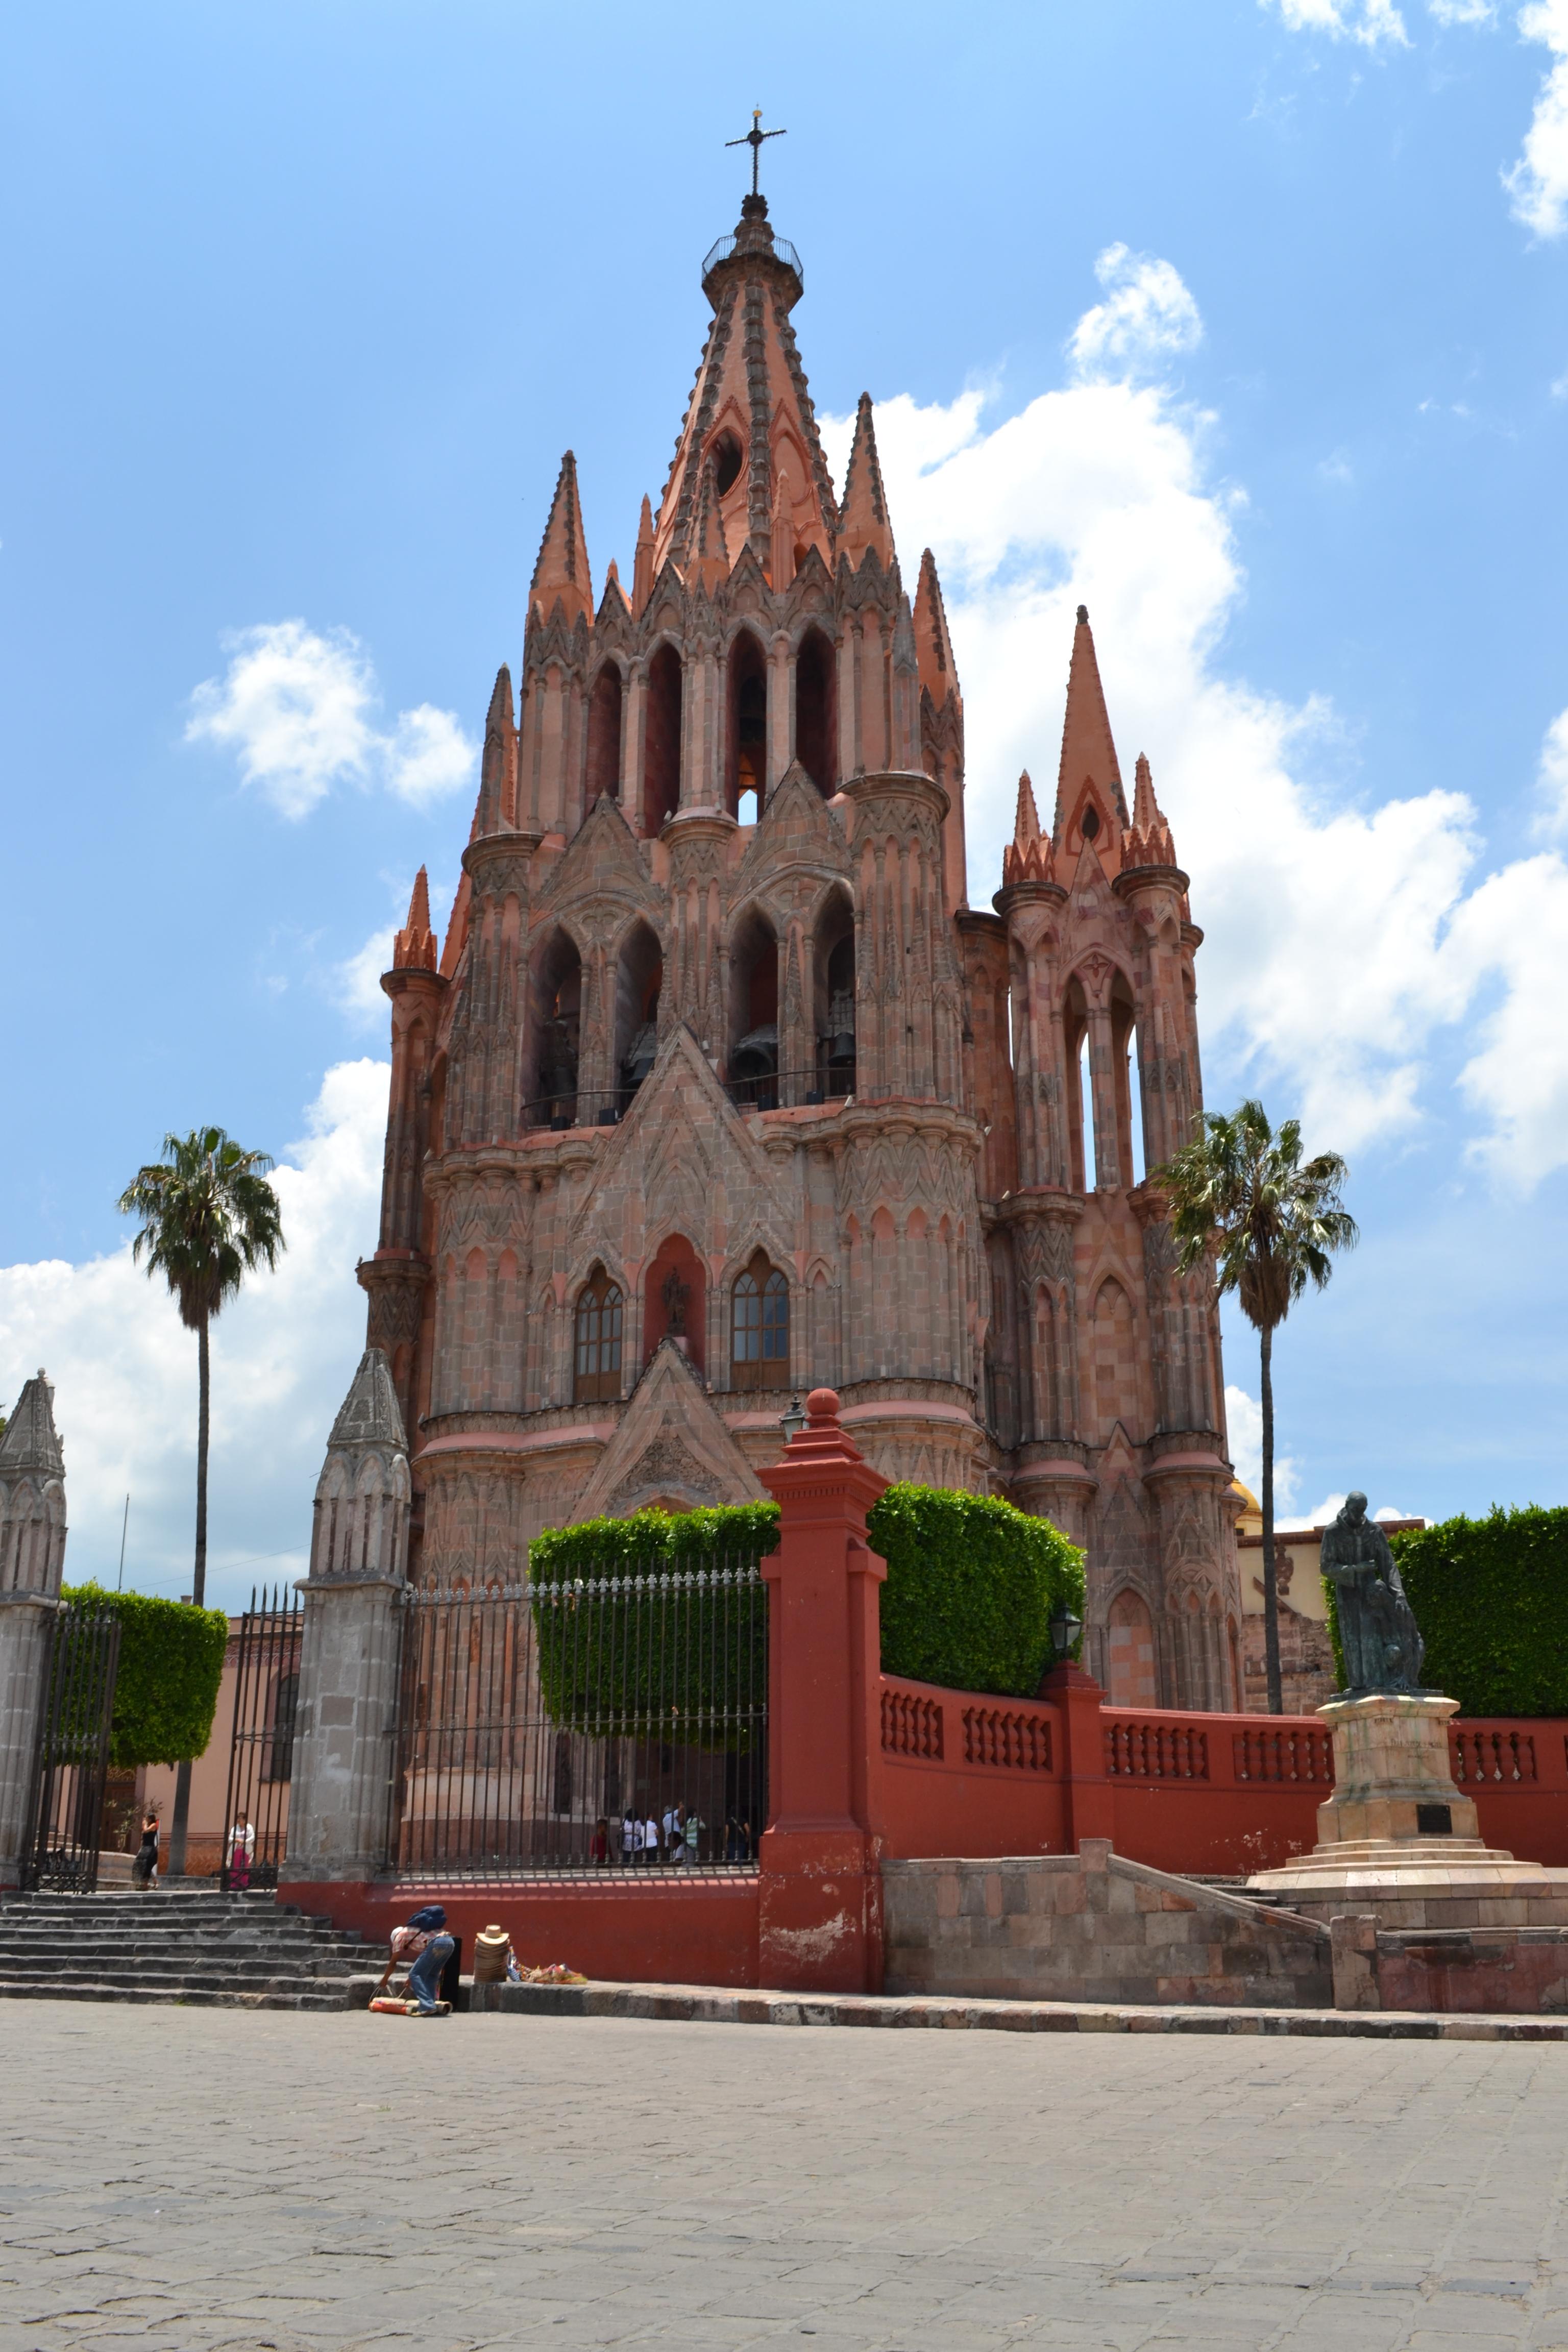 File:Iglesia de San Miguel de Allende.JPG - Wikimedia Commons